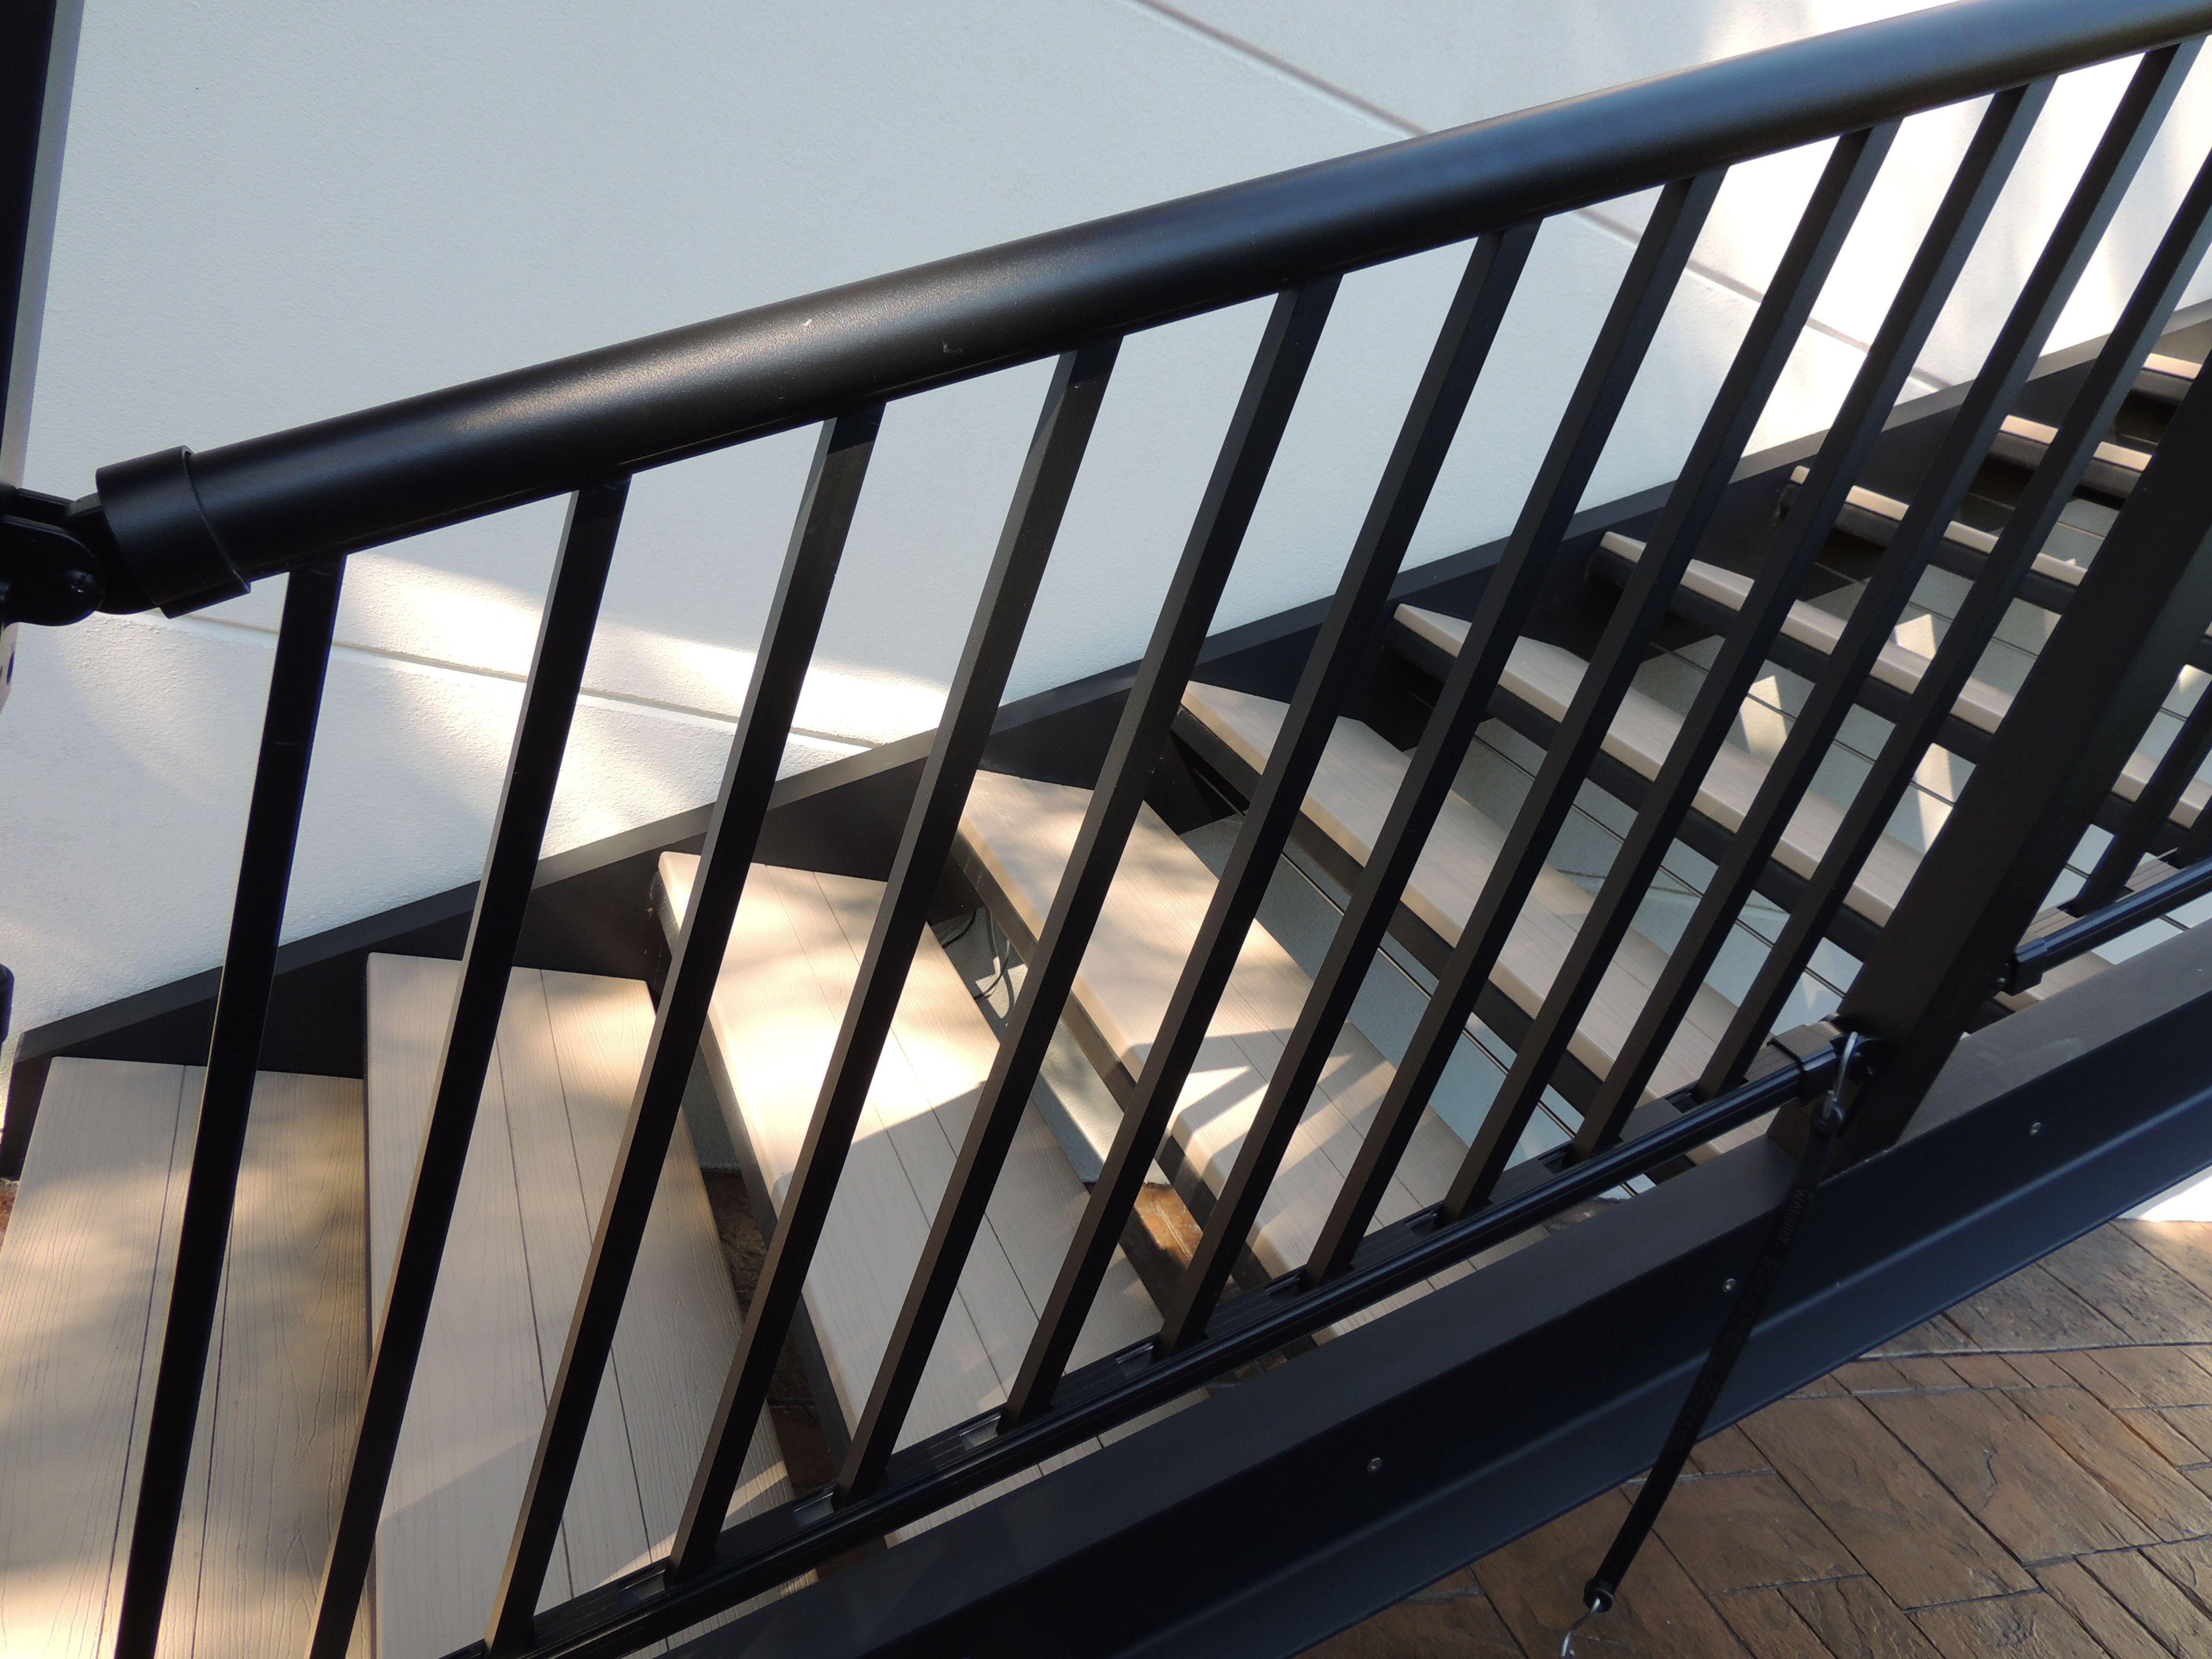 decorative aluminum railing. Black ornamental aluminum railing with round top rail  Railing